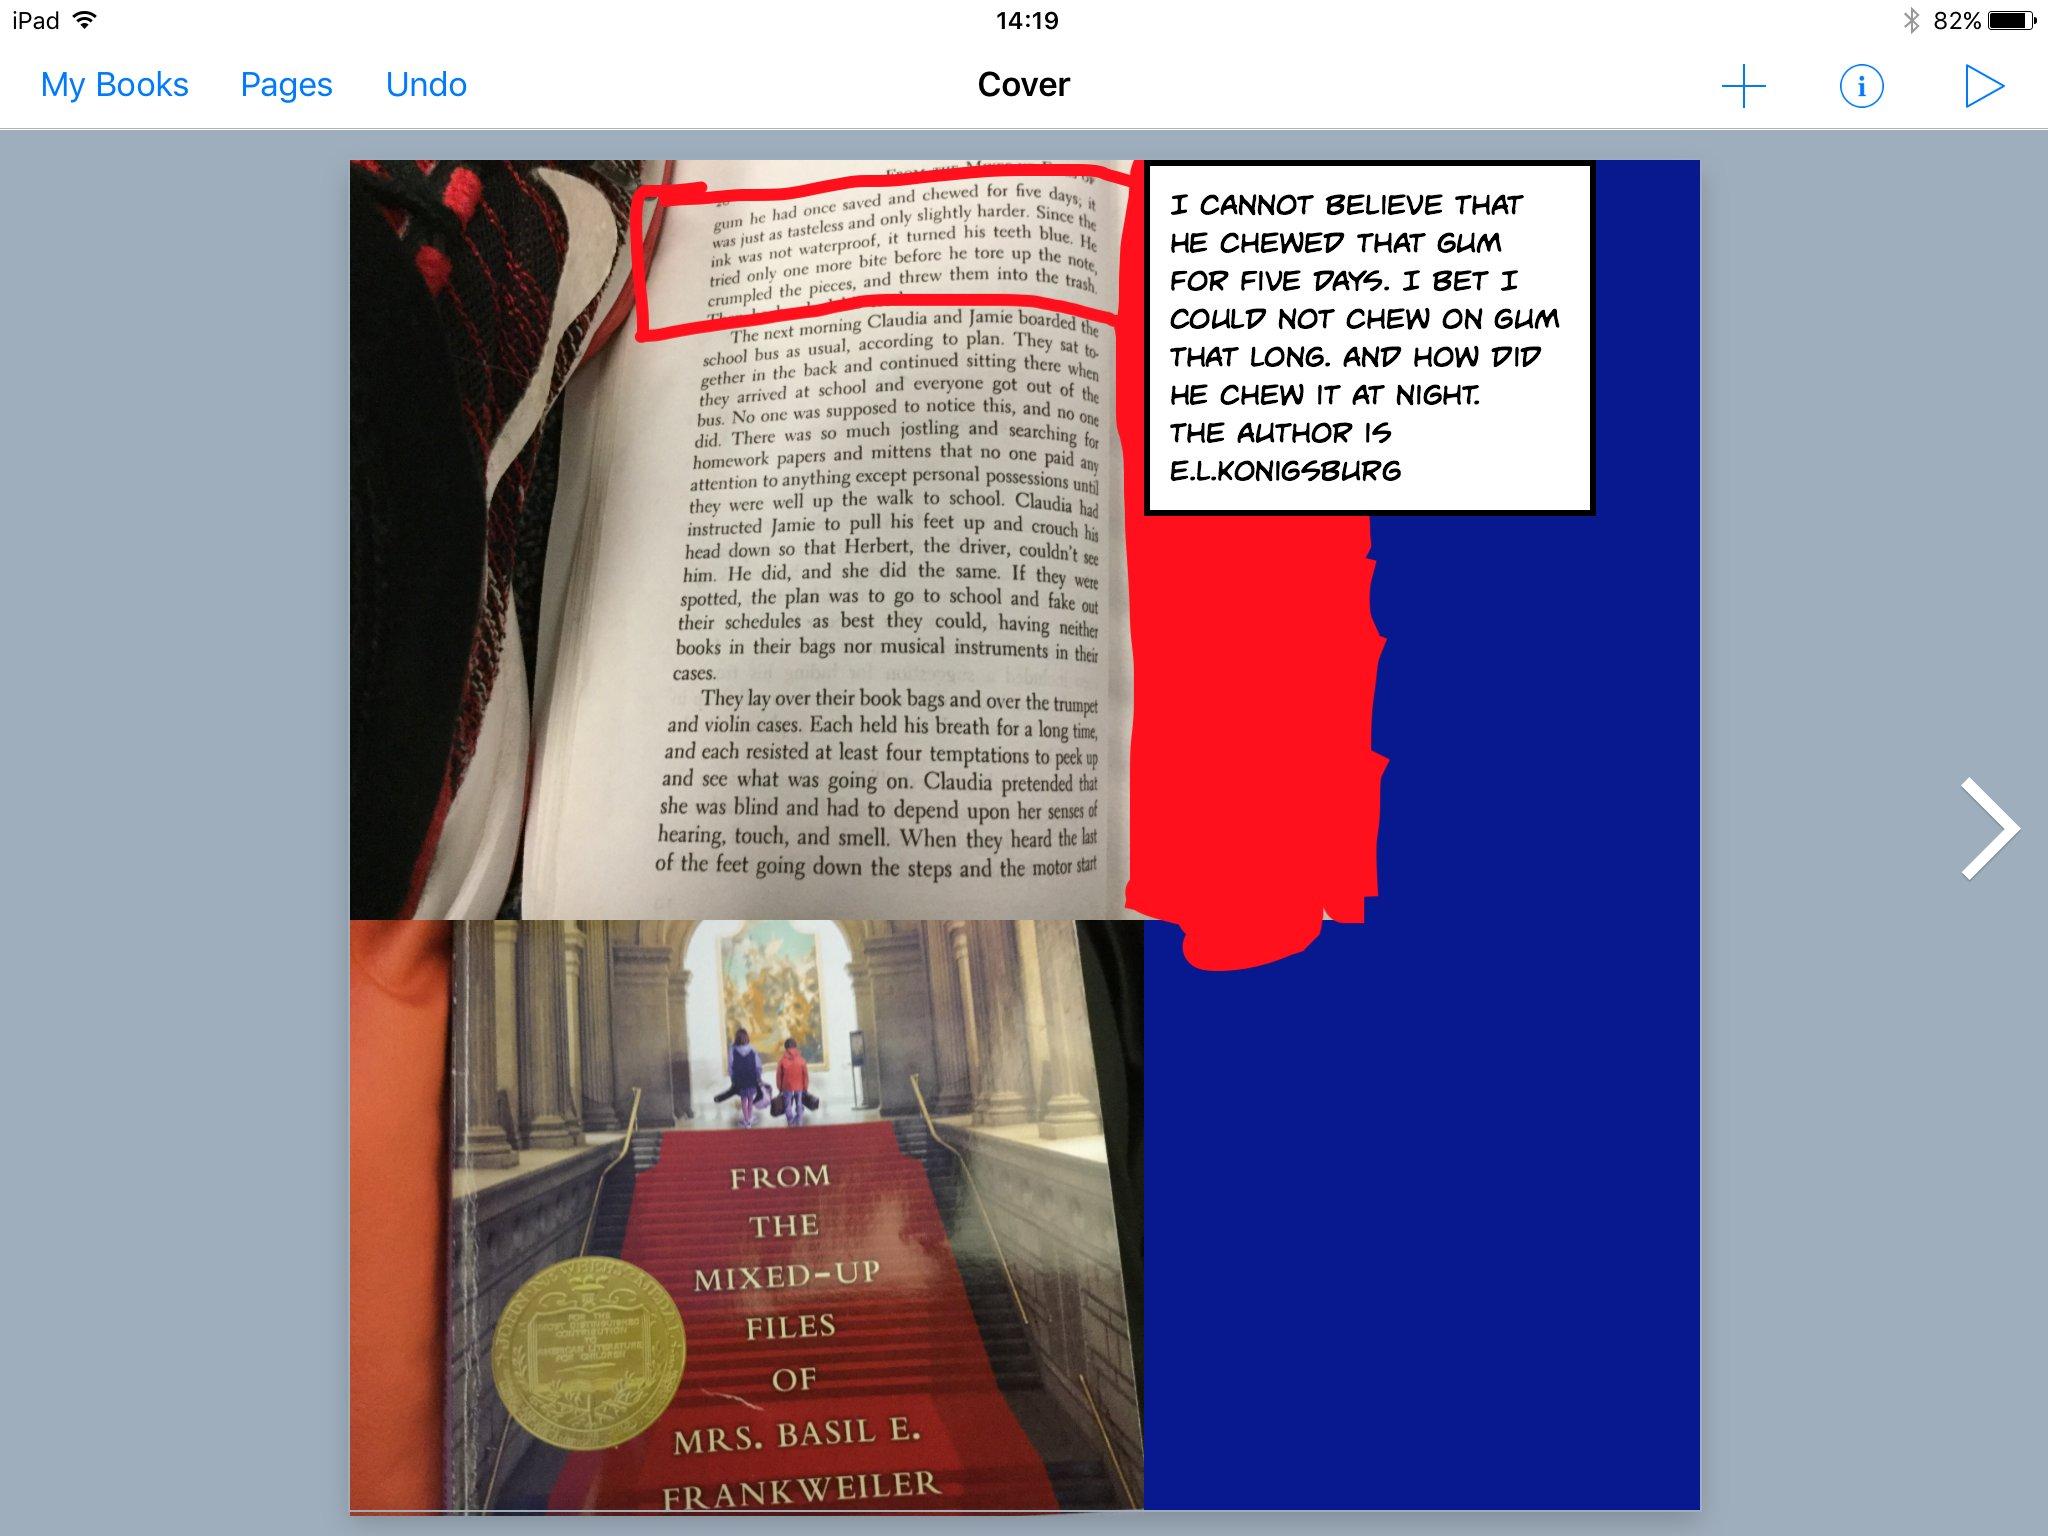 #booksnapswk2 #booksnaps MJ_4Vo @verovoig #betl https://t.co/853YlkmmMS